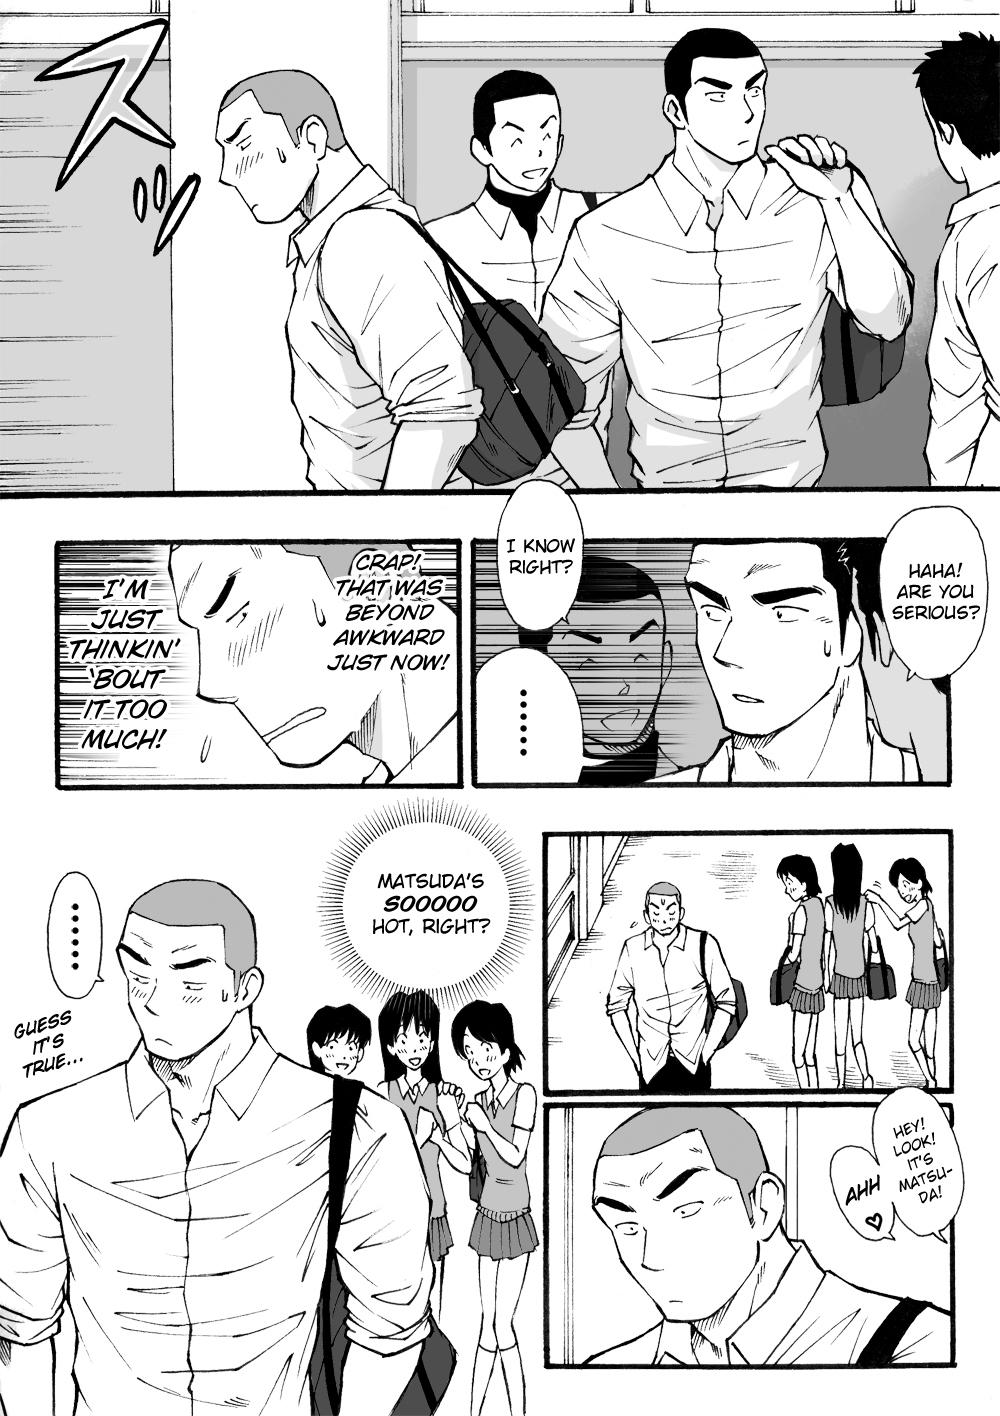 [Akahachi] Motemote Yakyuubu Otoko [Kouhen] | Popular Baseball Club Boys (Part Two) [English] [Papatez] 8